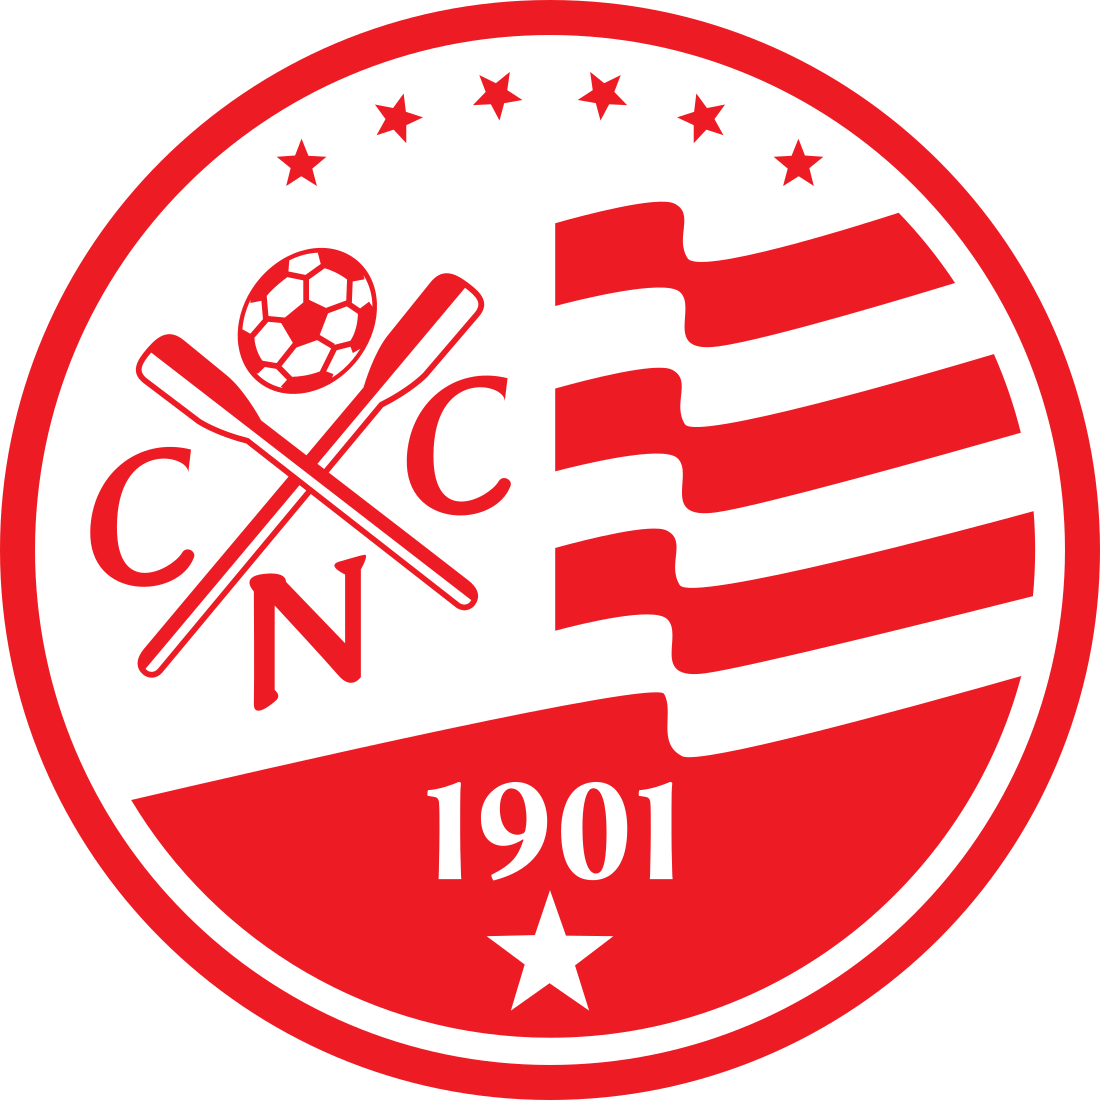 nautico logo escudo 3 - Náutico Logo - Escudo - Clube Náutico Capibaribe Logo - Escudo